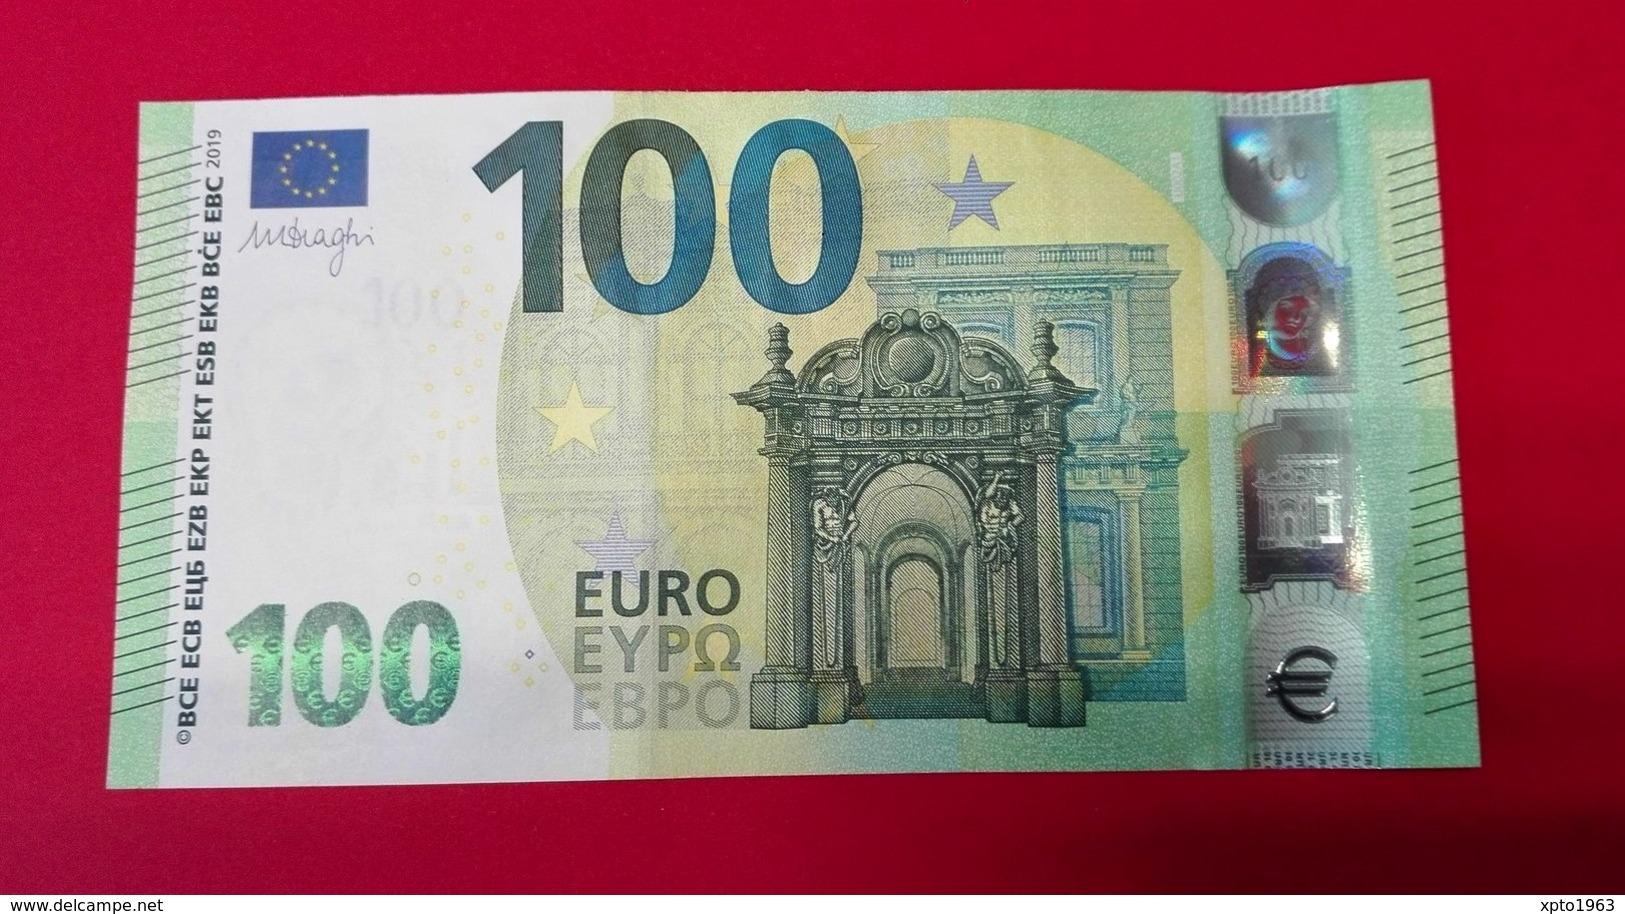 100 EURO - U002A1 - FRANCE - Série Europa - UA0039726075 - UNC NEUF - EURO